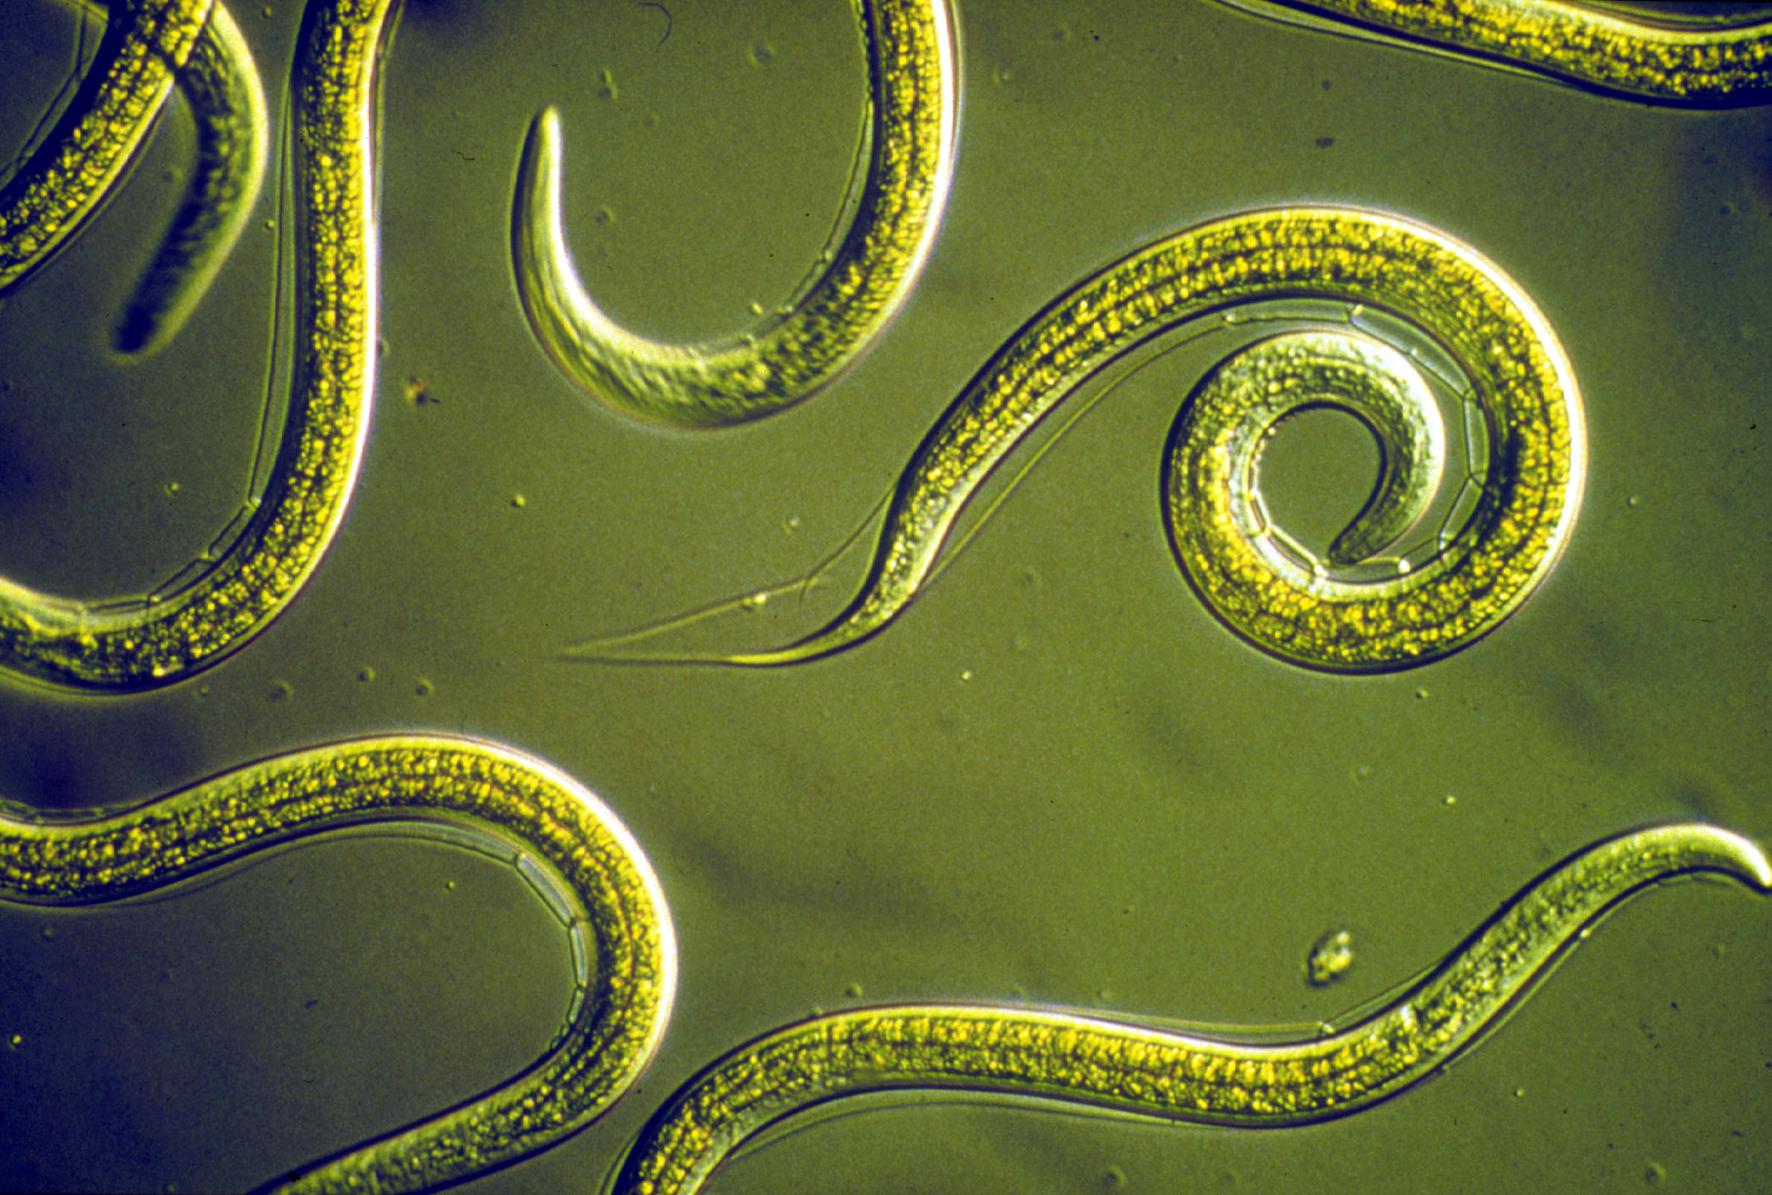 Oxiuros nome popular. Parasitos oxiuros sintomas Historia Natura Parasitismo Intestinl Niños